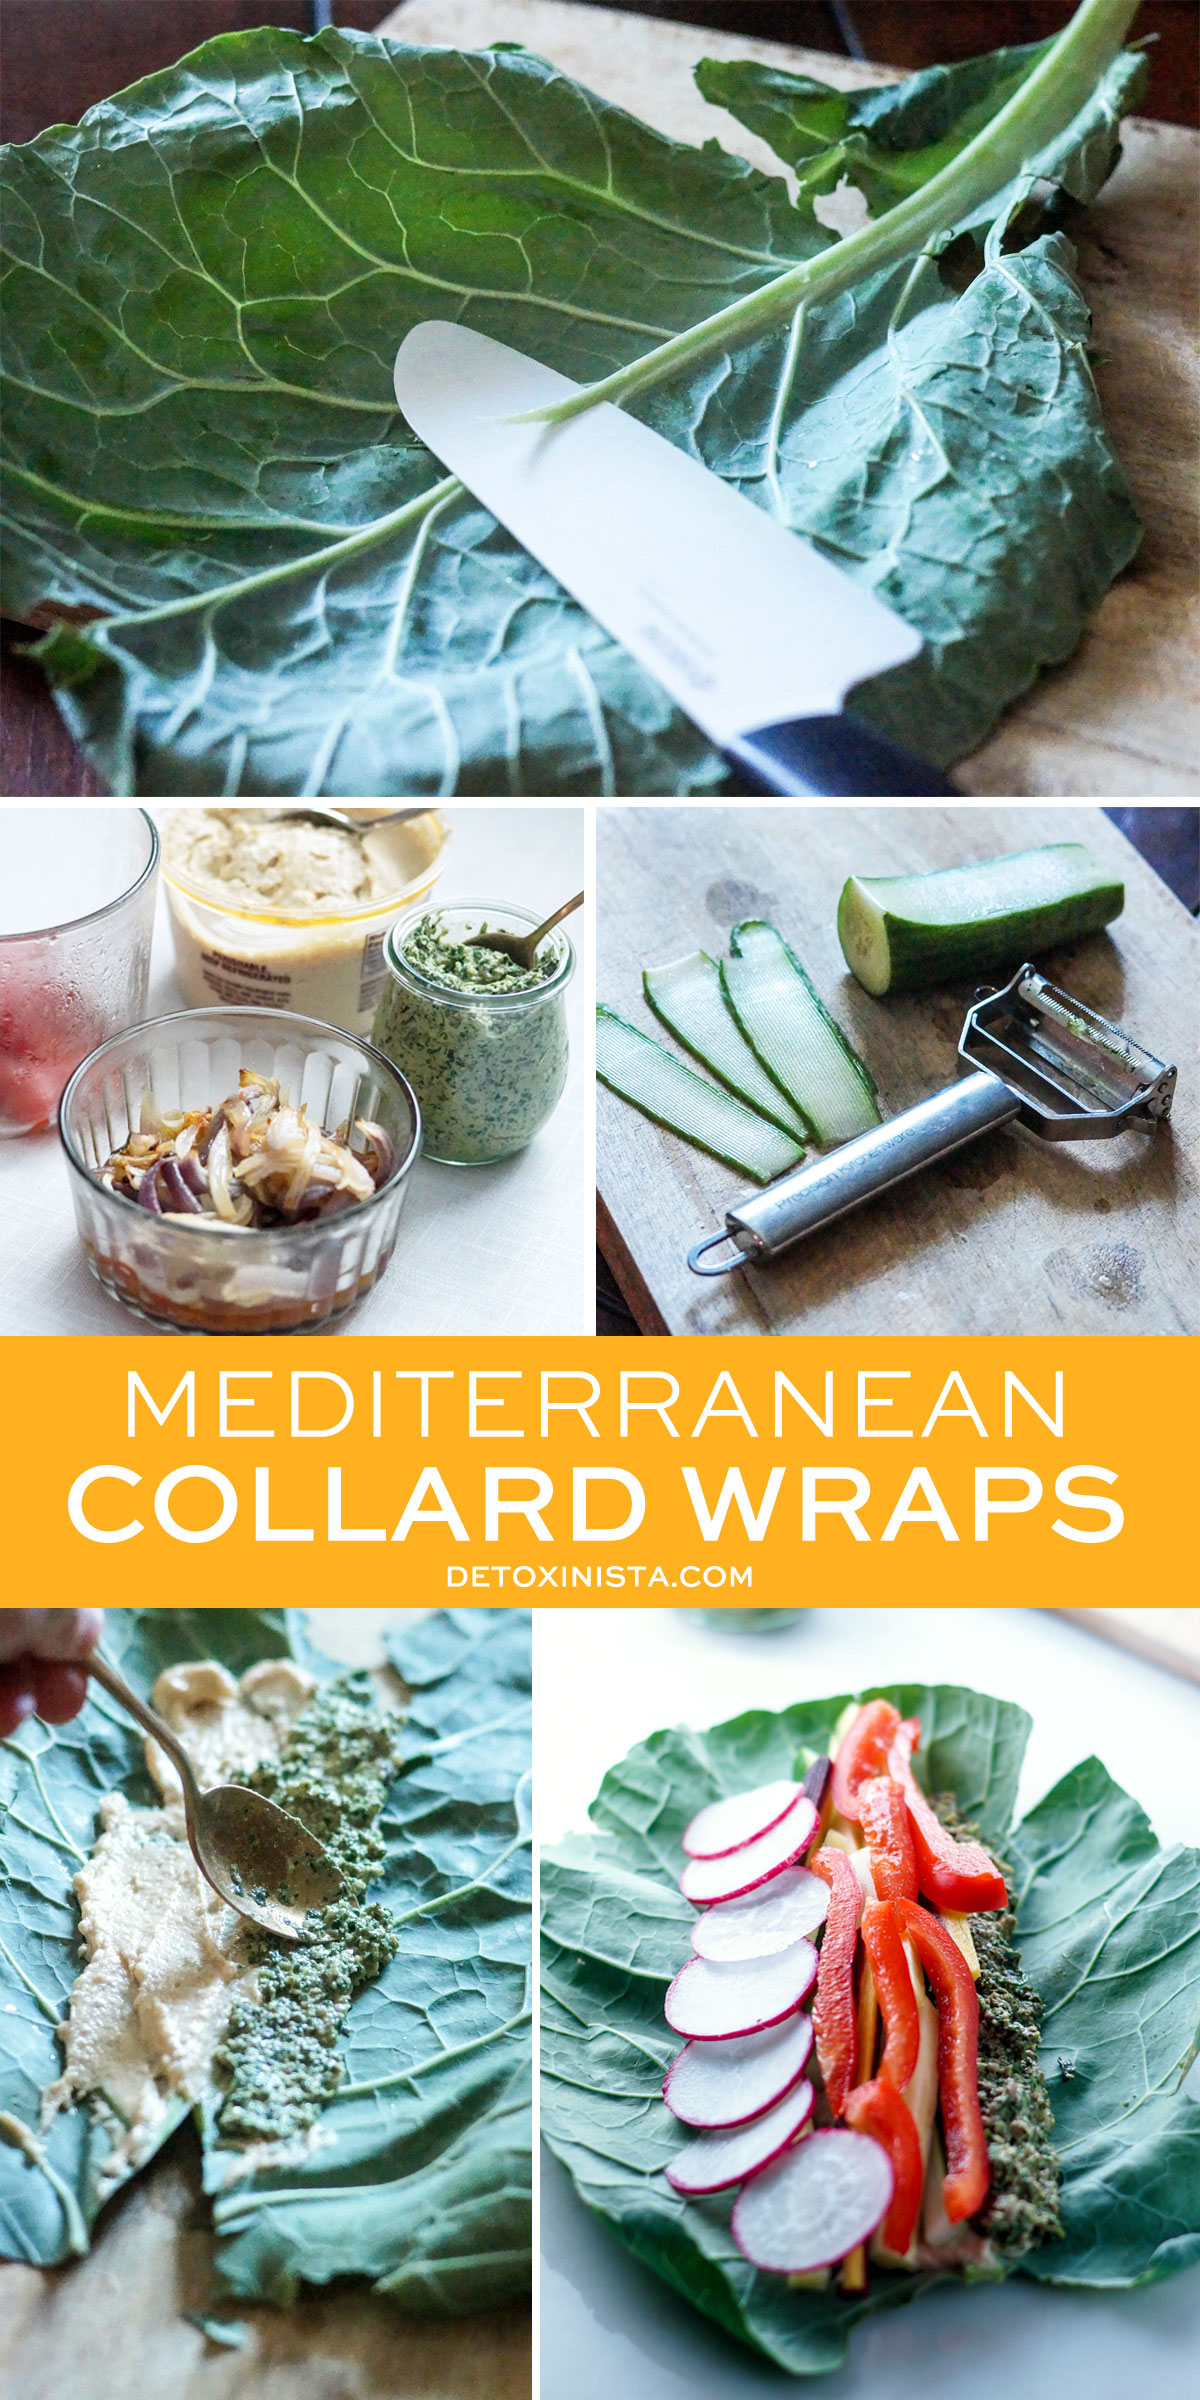 assembling mediterranean collard wraps